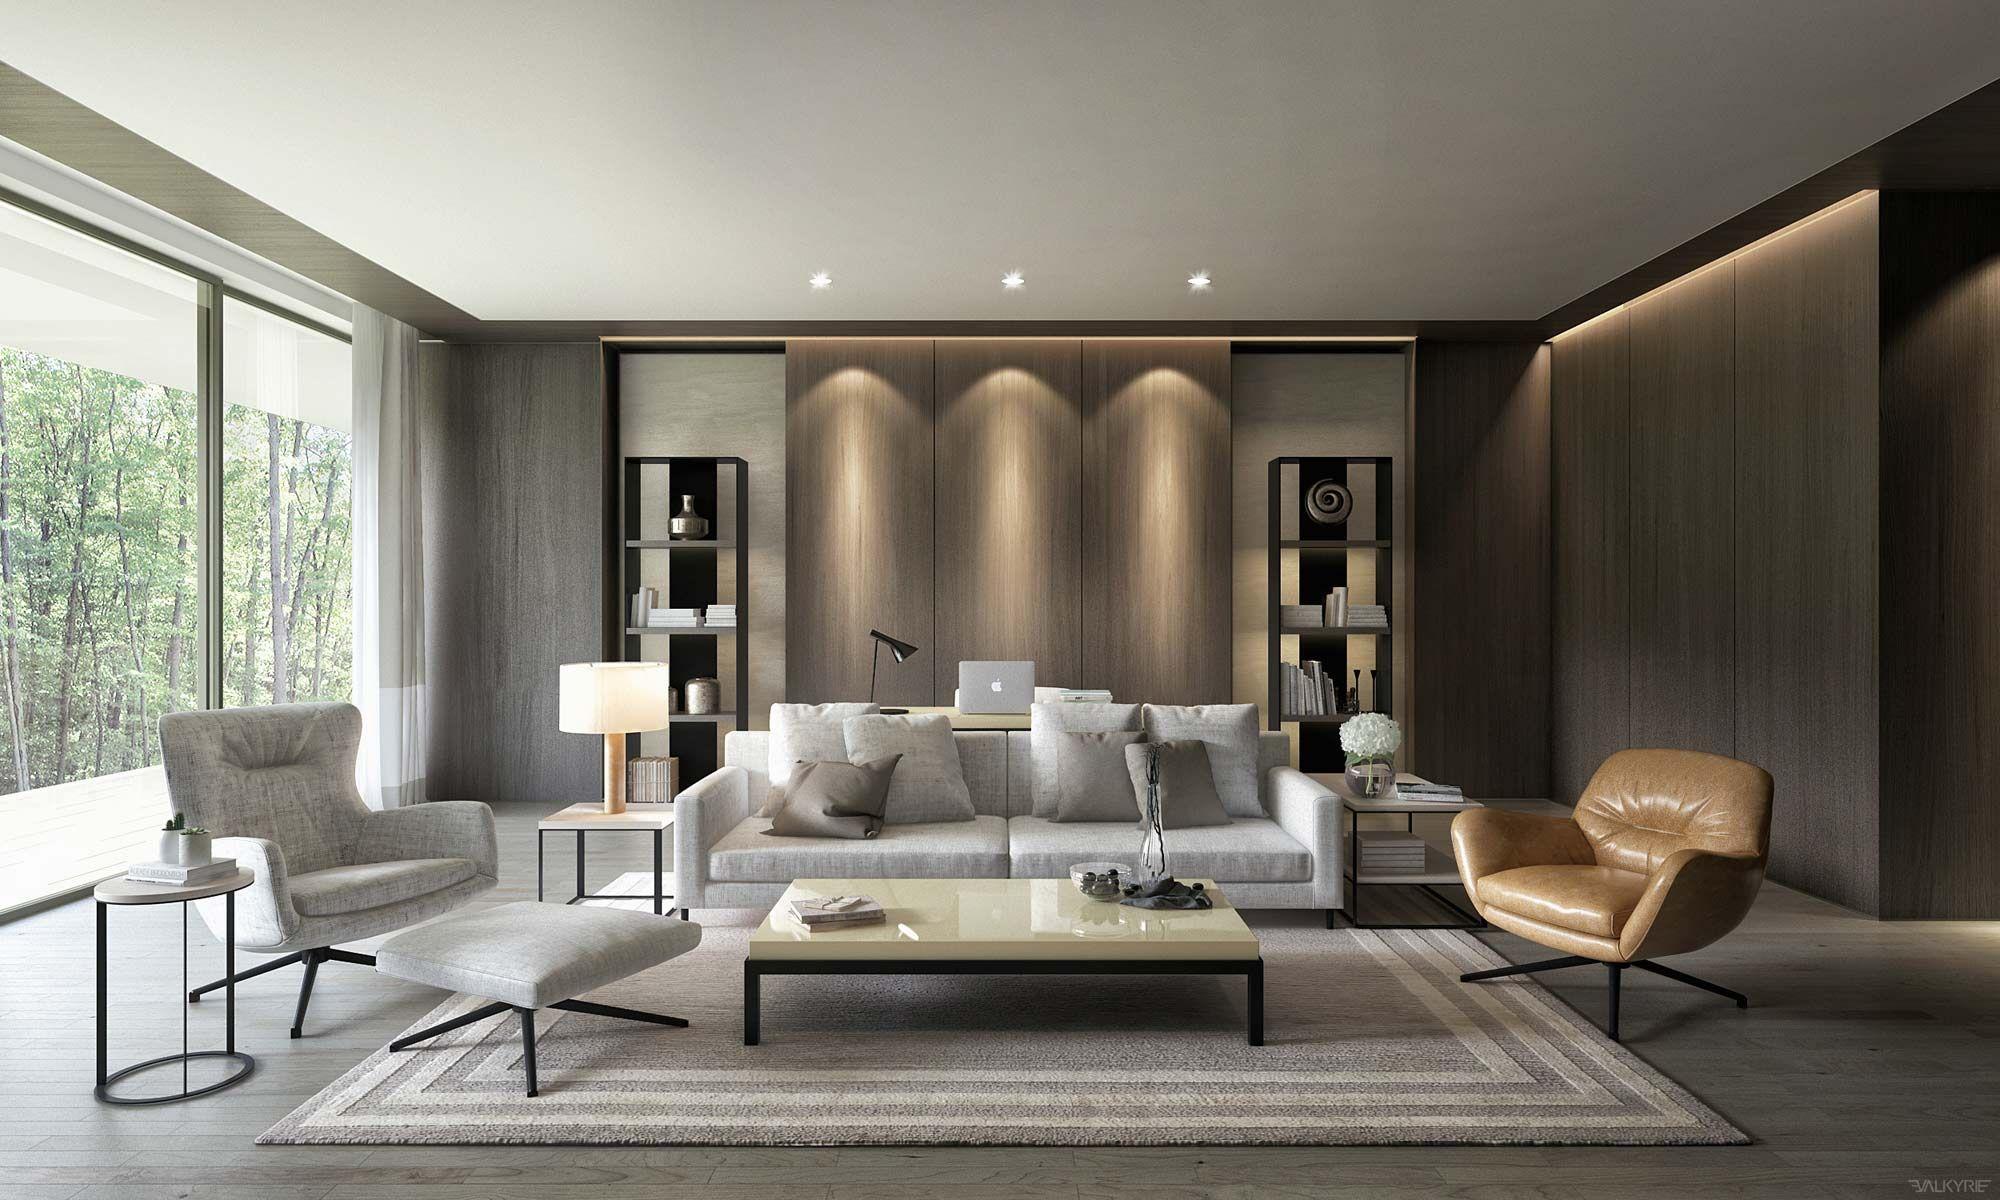 Pin von Natalia Moscoso Horruitiner auf Interior Design my passion ...